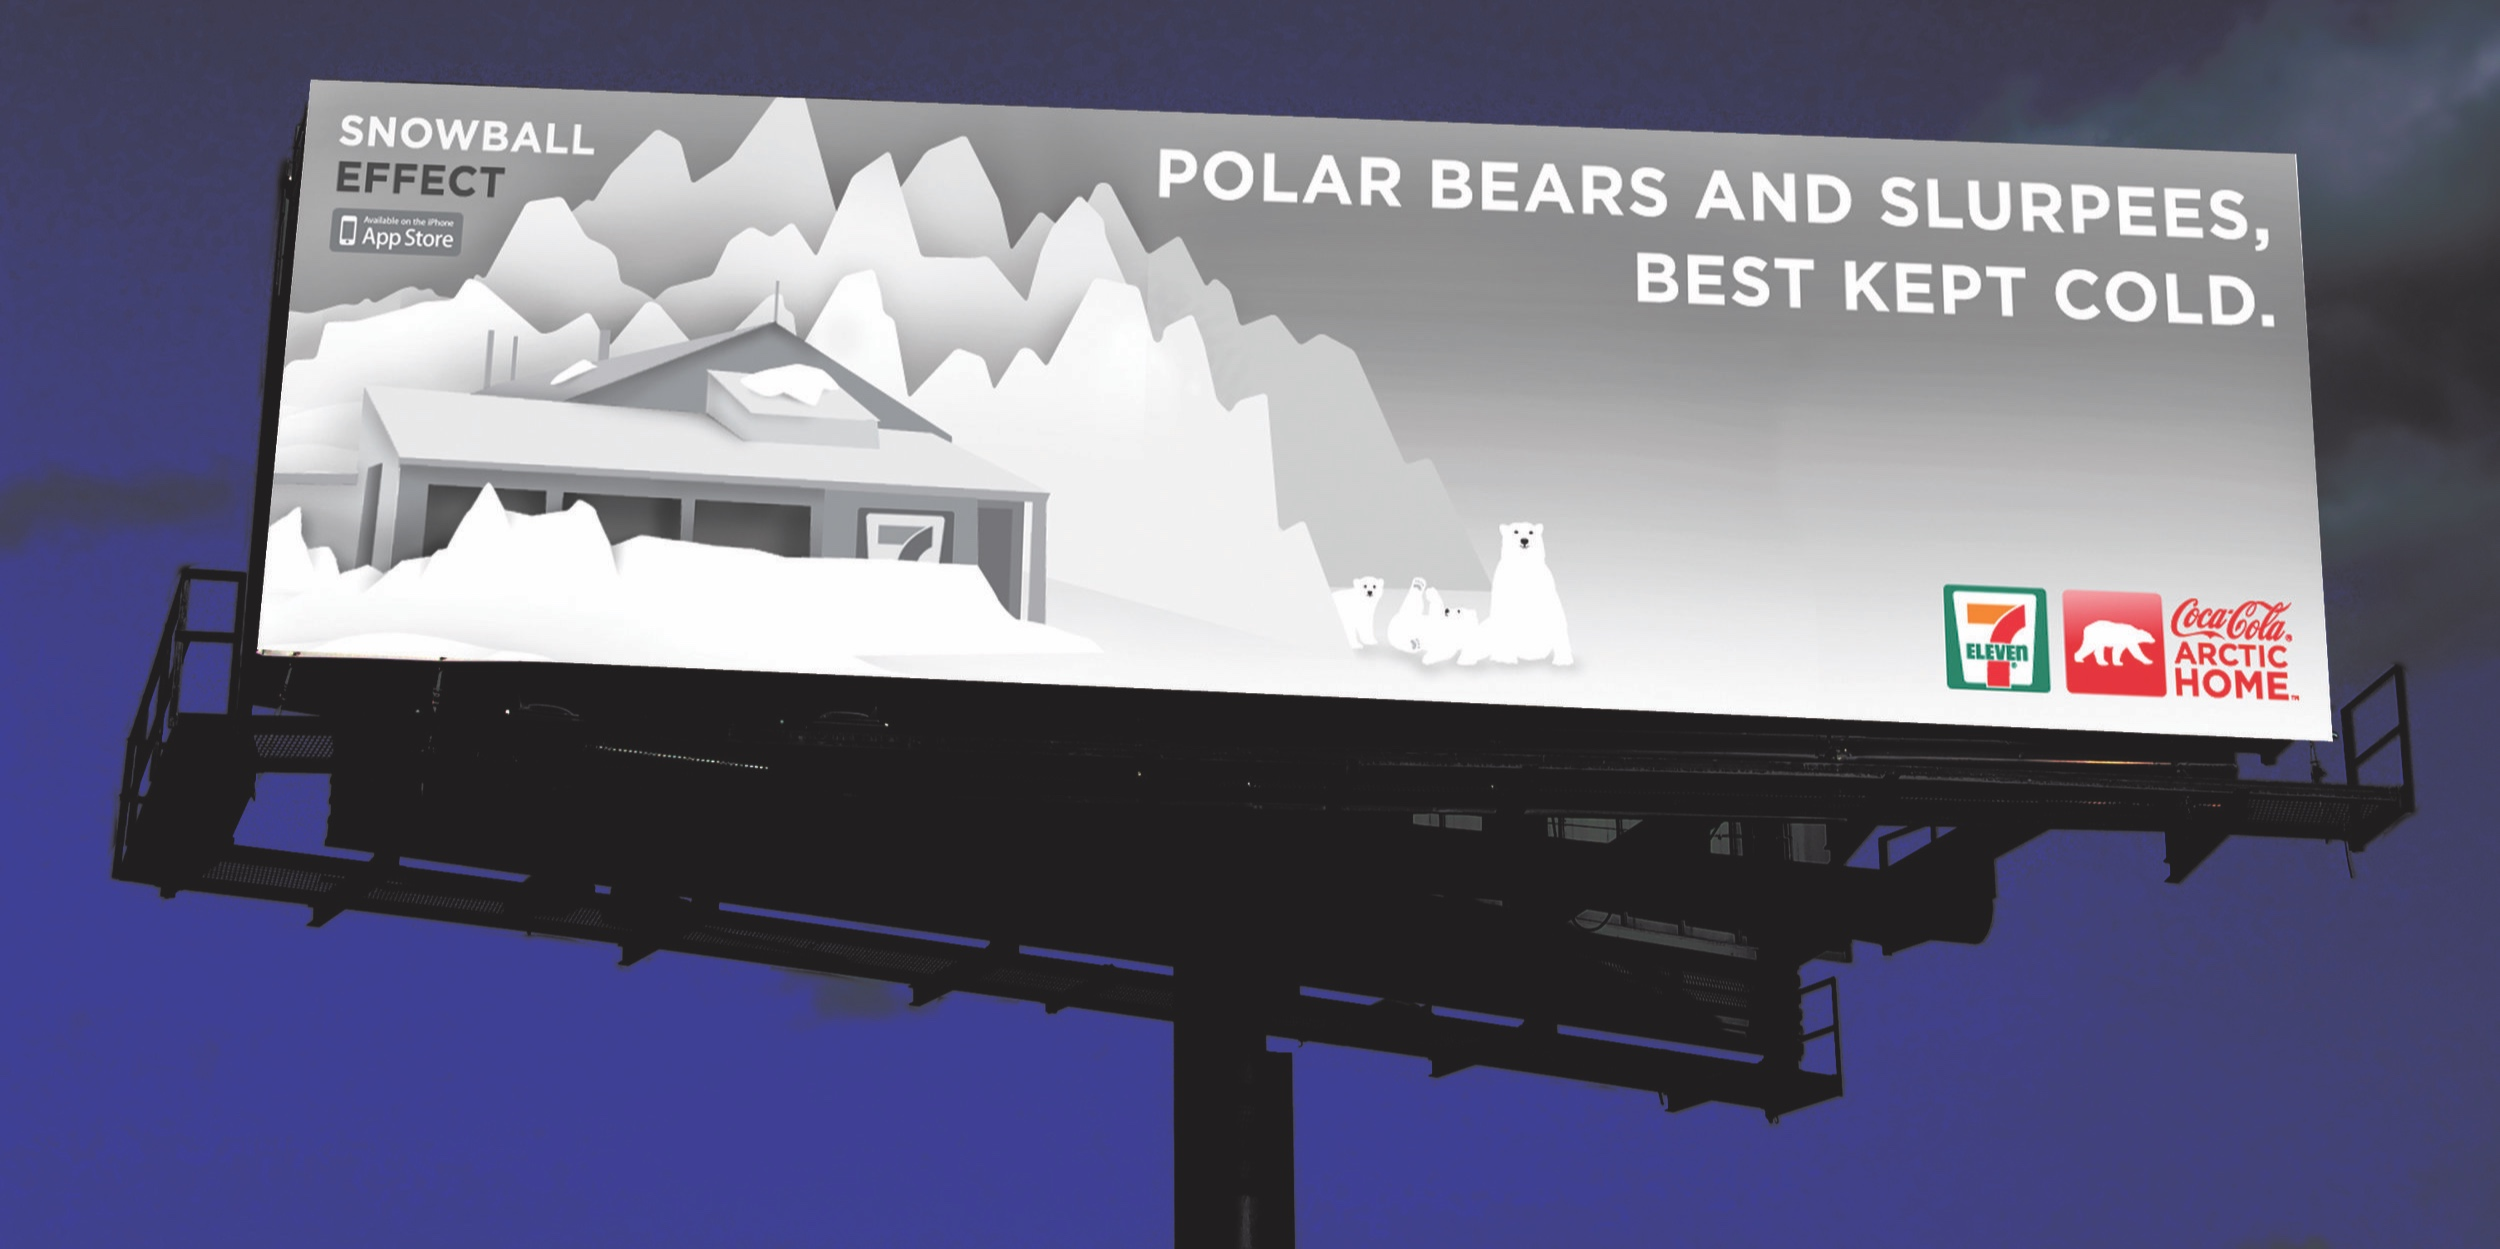 Adams_AH_billboard.jpg